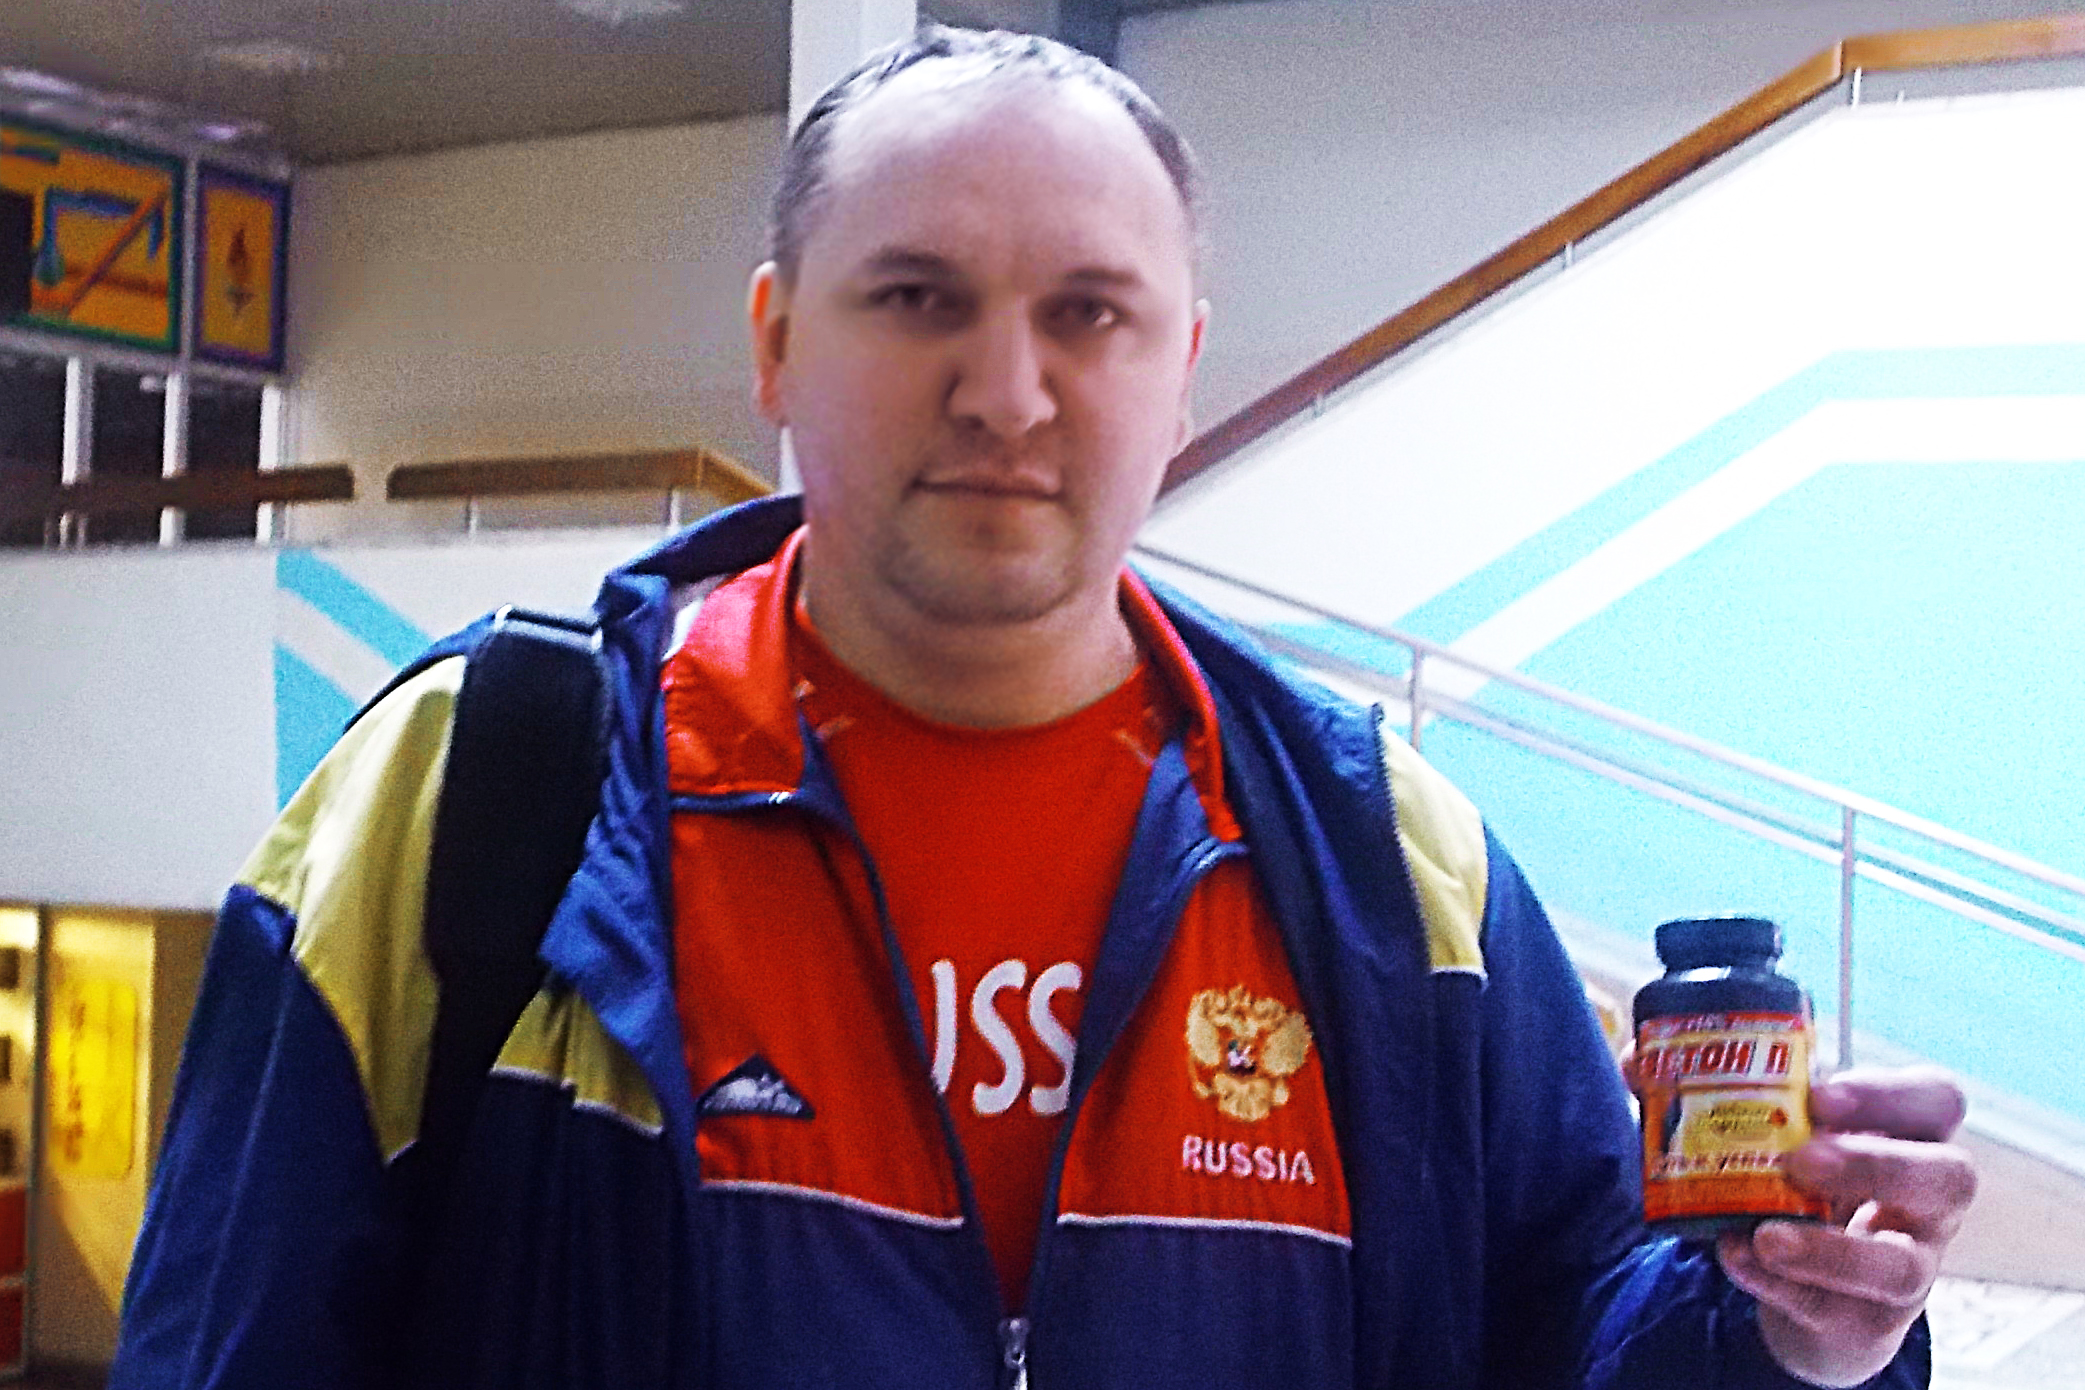 Москвин Михаил тренер по боксу Пенза